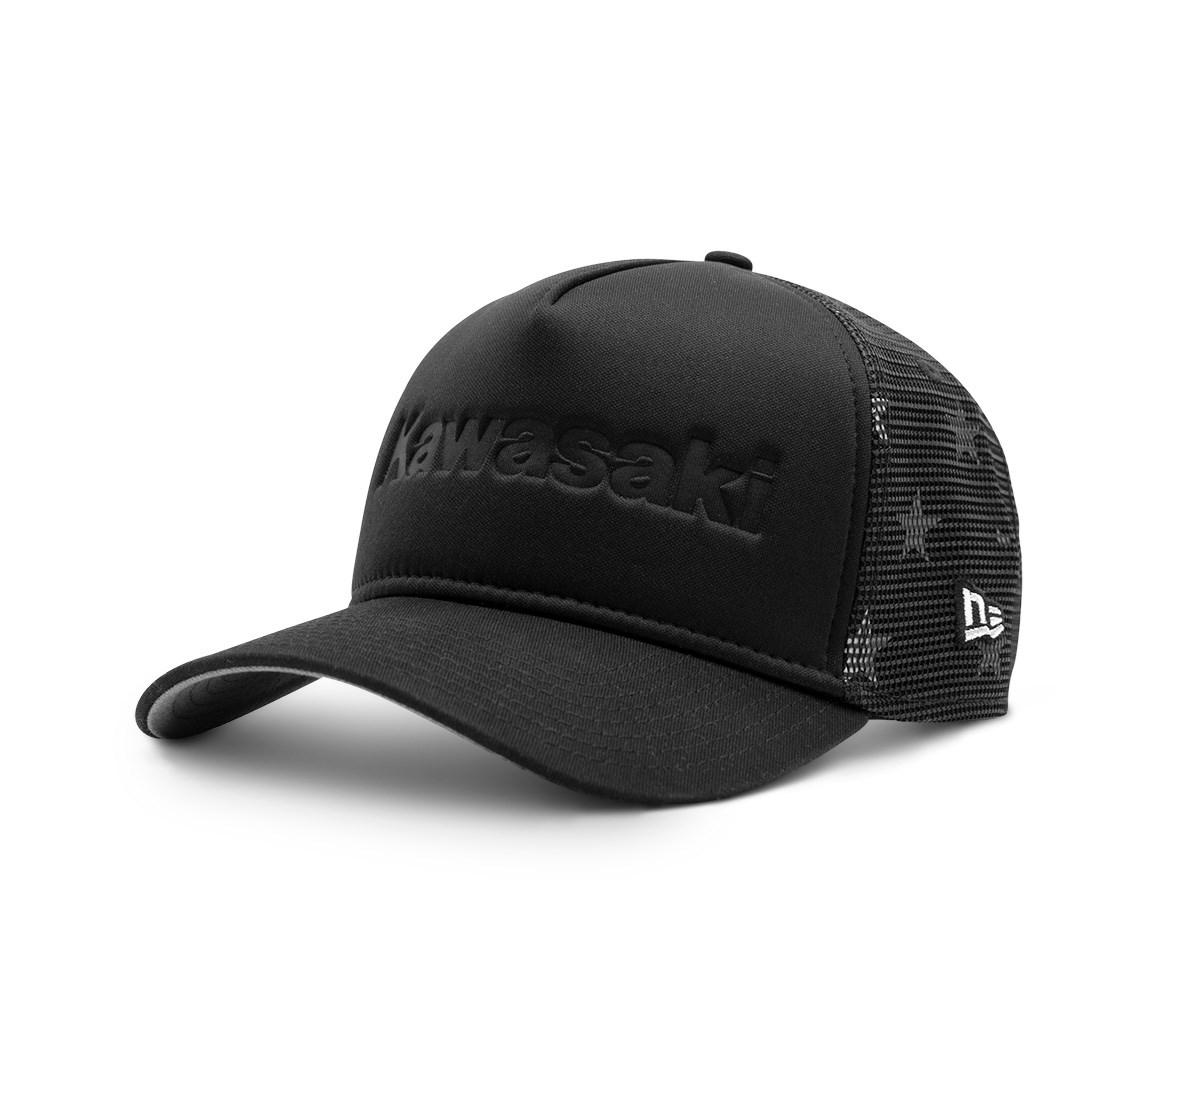 Oem Kawasaki New Era 9fifty 3 Lines Logo Cap Adjustable Hat Black K007-4062-BKNS